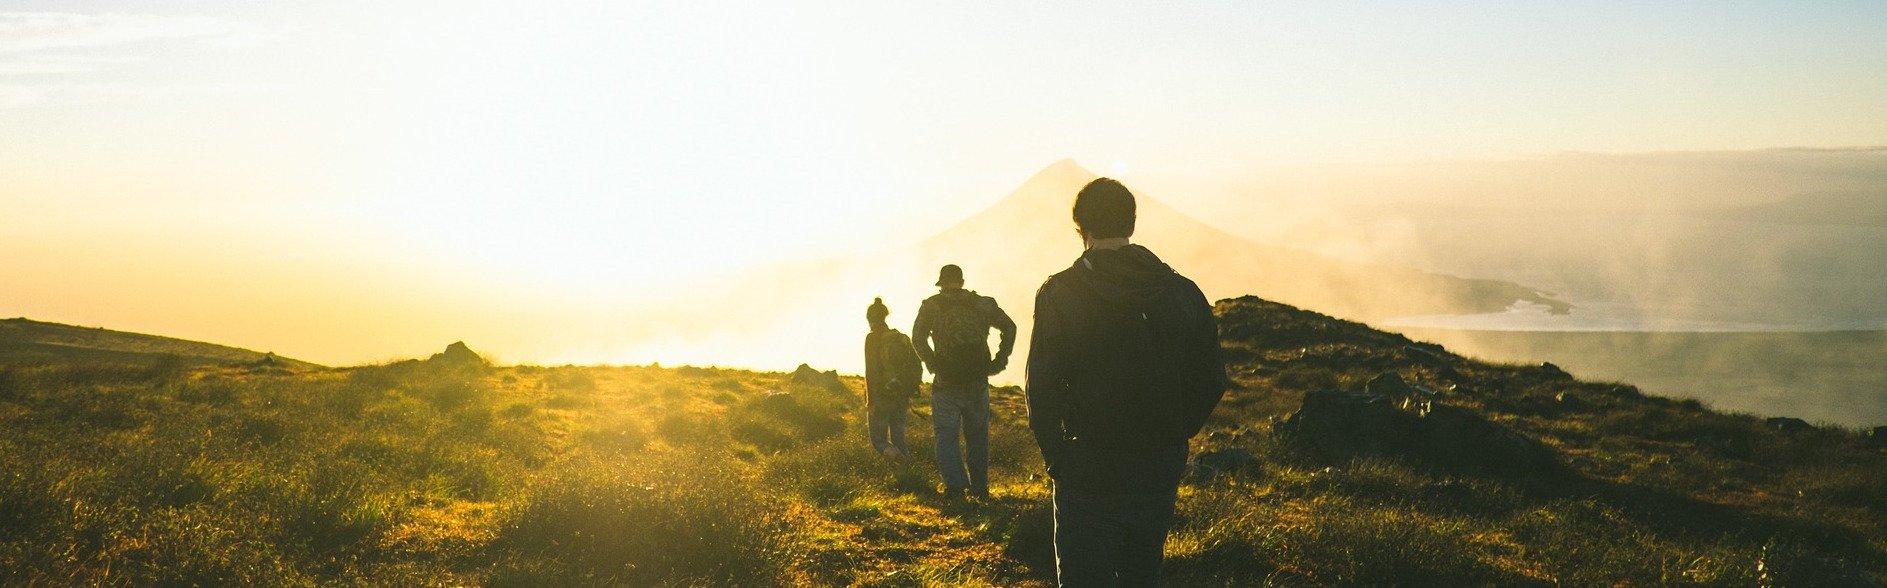 Top 5 Loch Tay Adventures - Visit Loch Tay